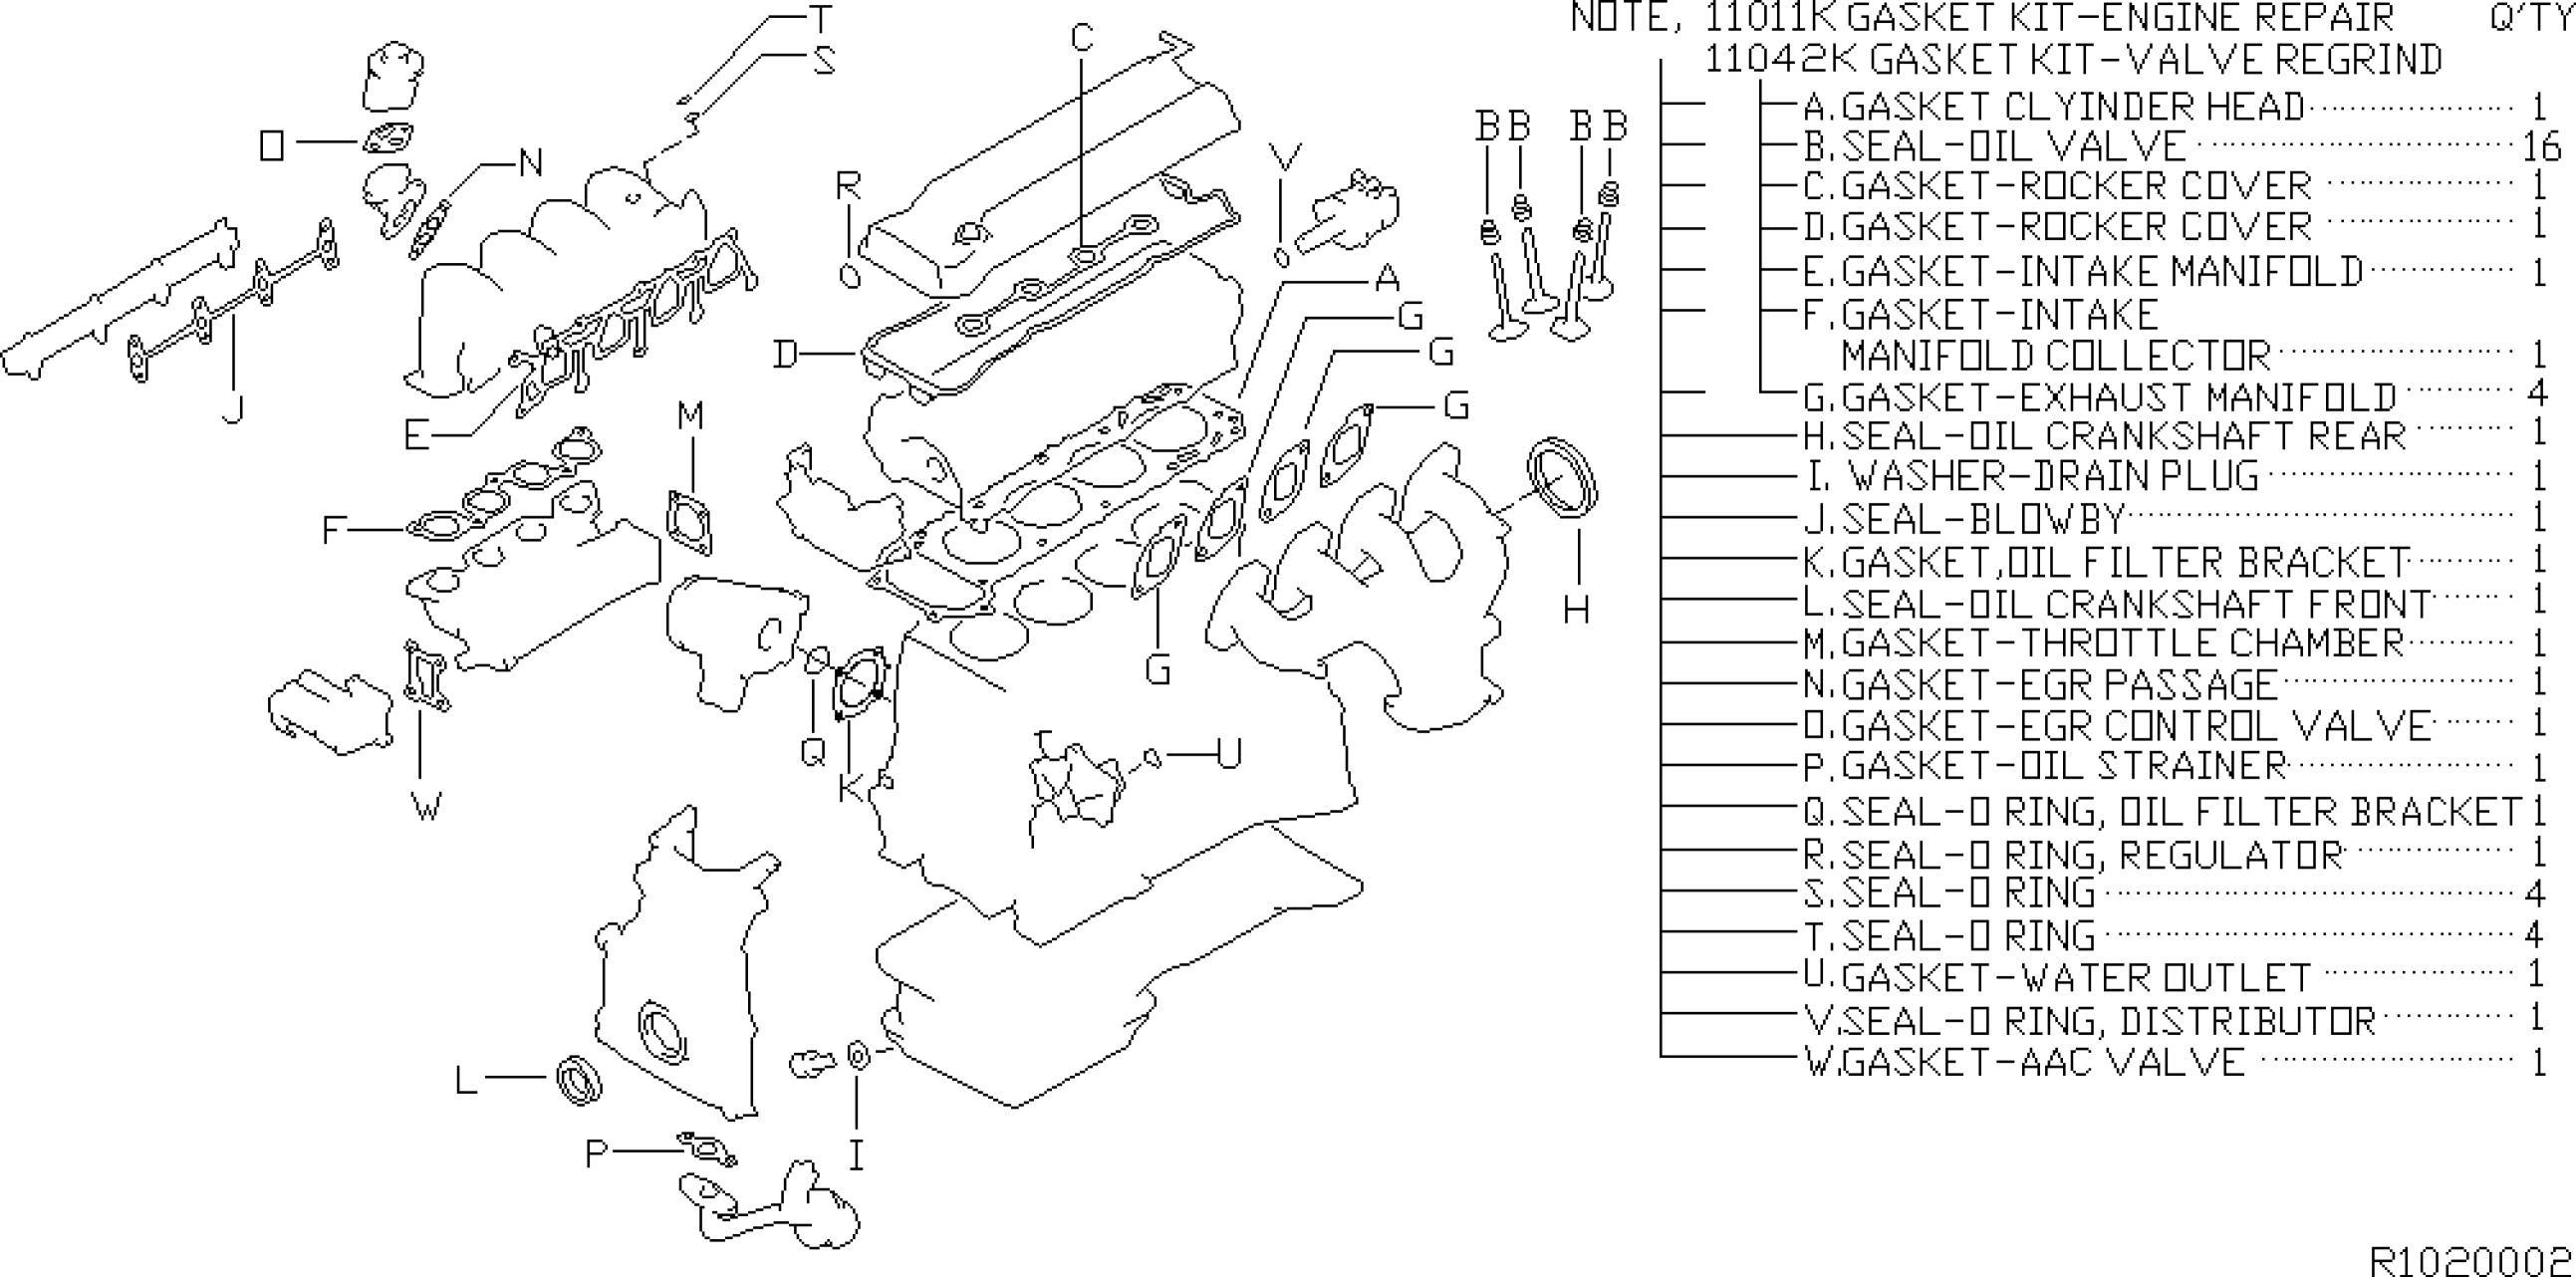 1998 Nissan Altima Engine Diagram 2003 Nissan Altima 2 5